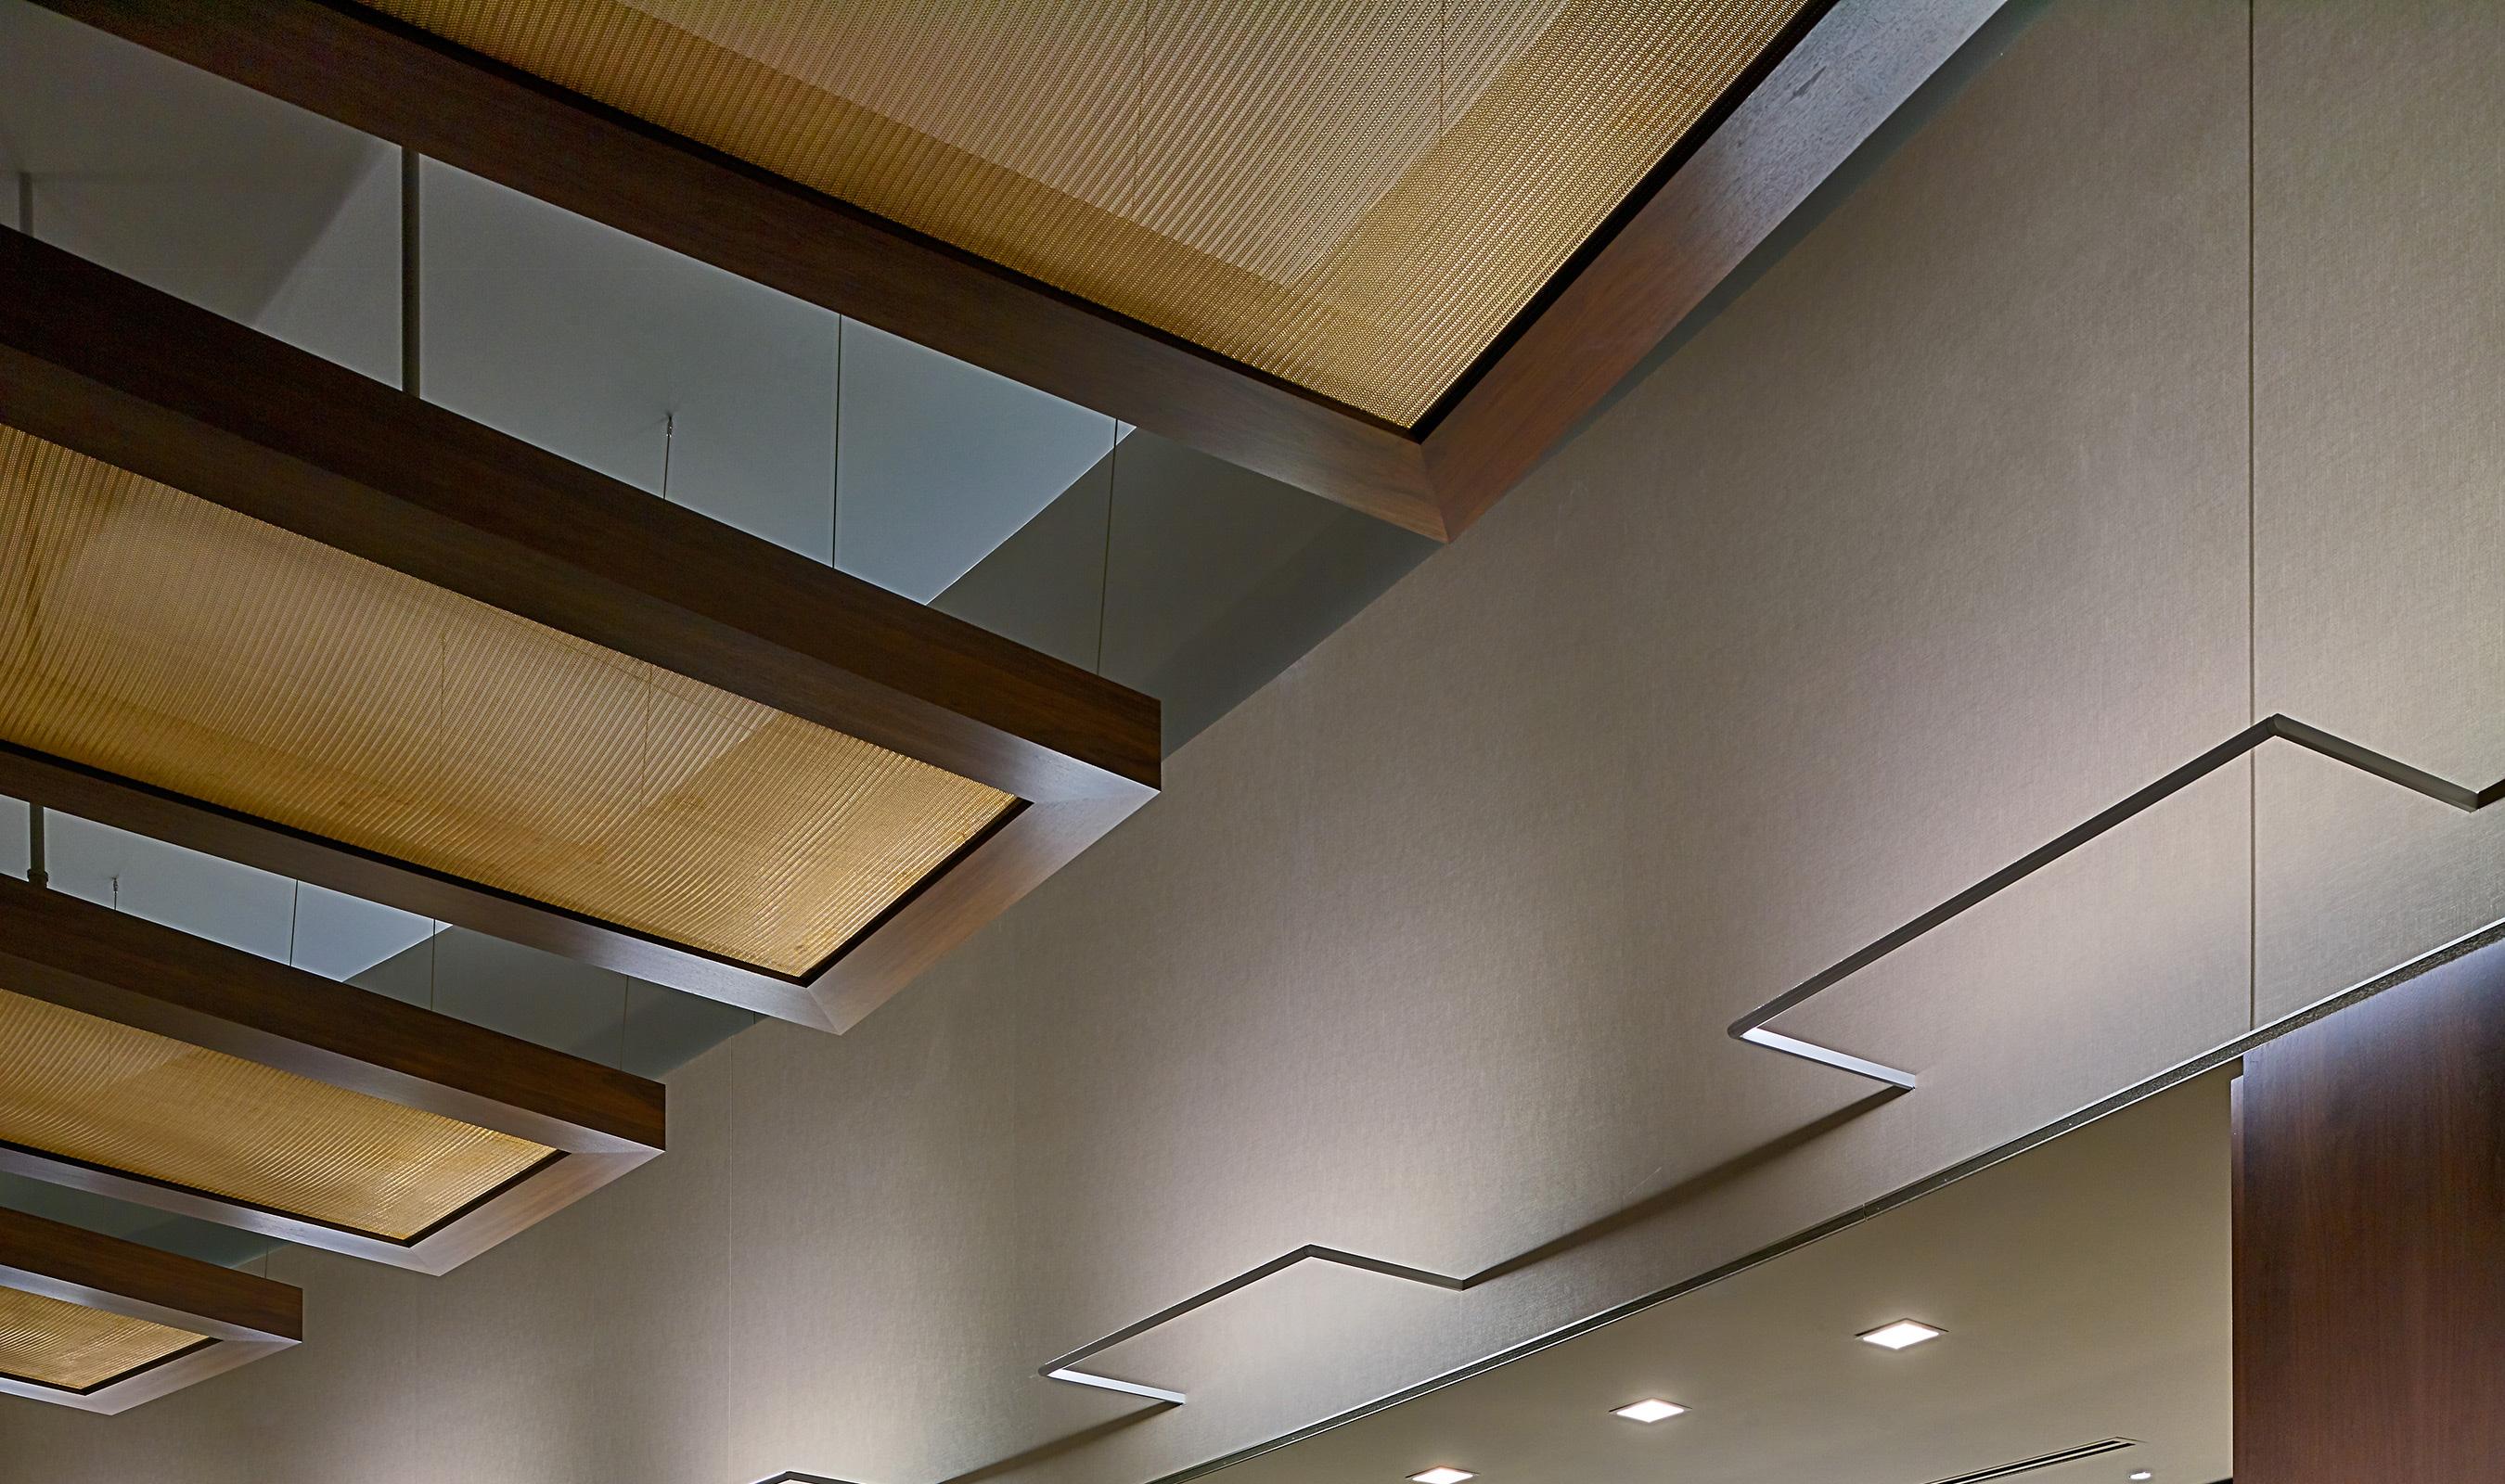 M13Z-293 Ceiling Accent